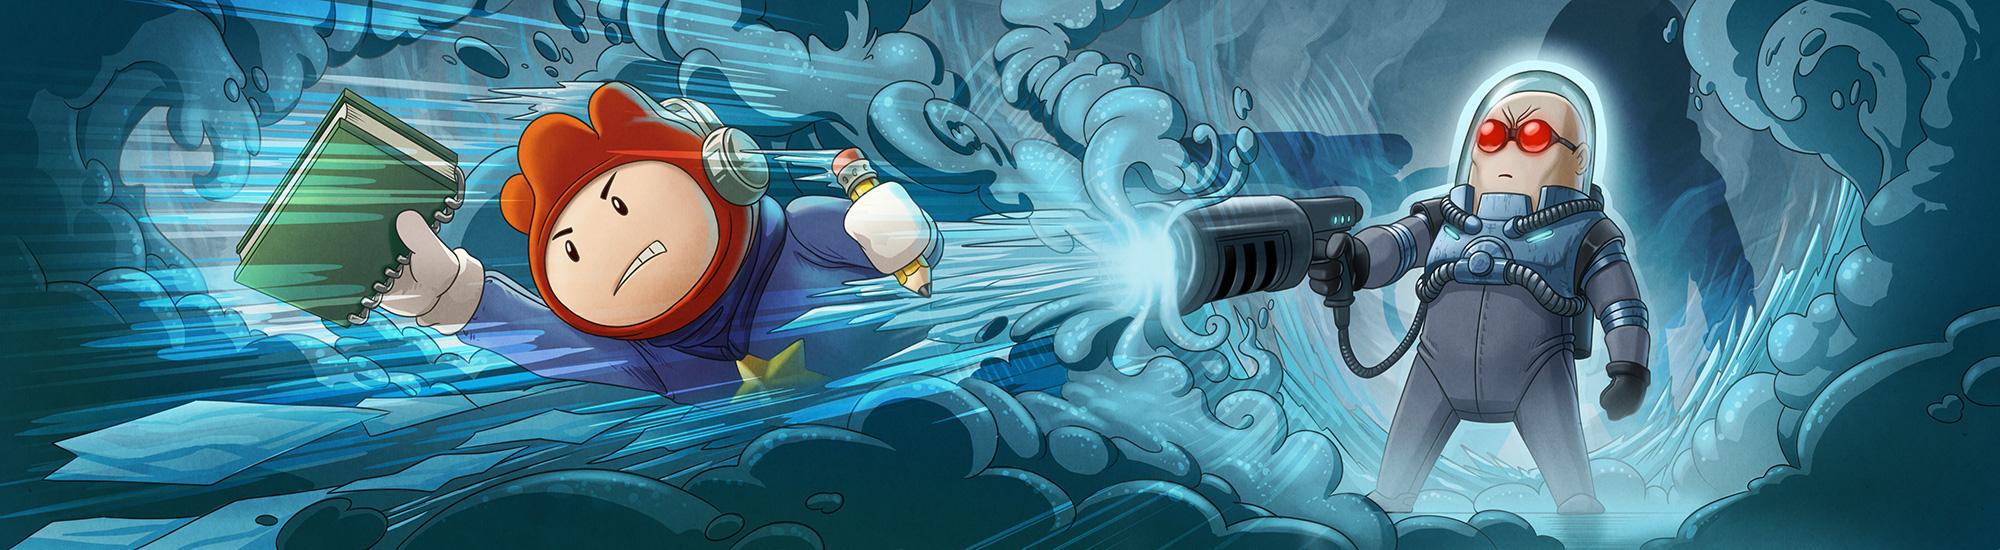 Mr. Freeze vs Maxwell by Darkodev